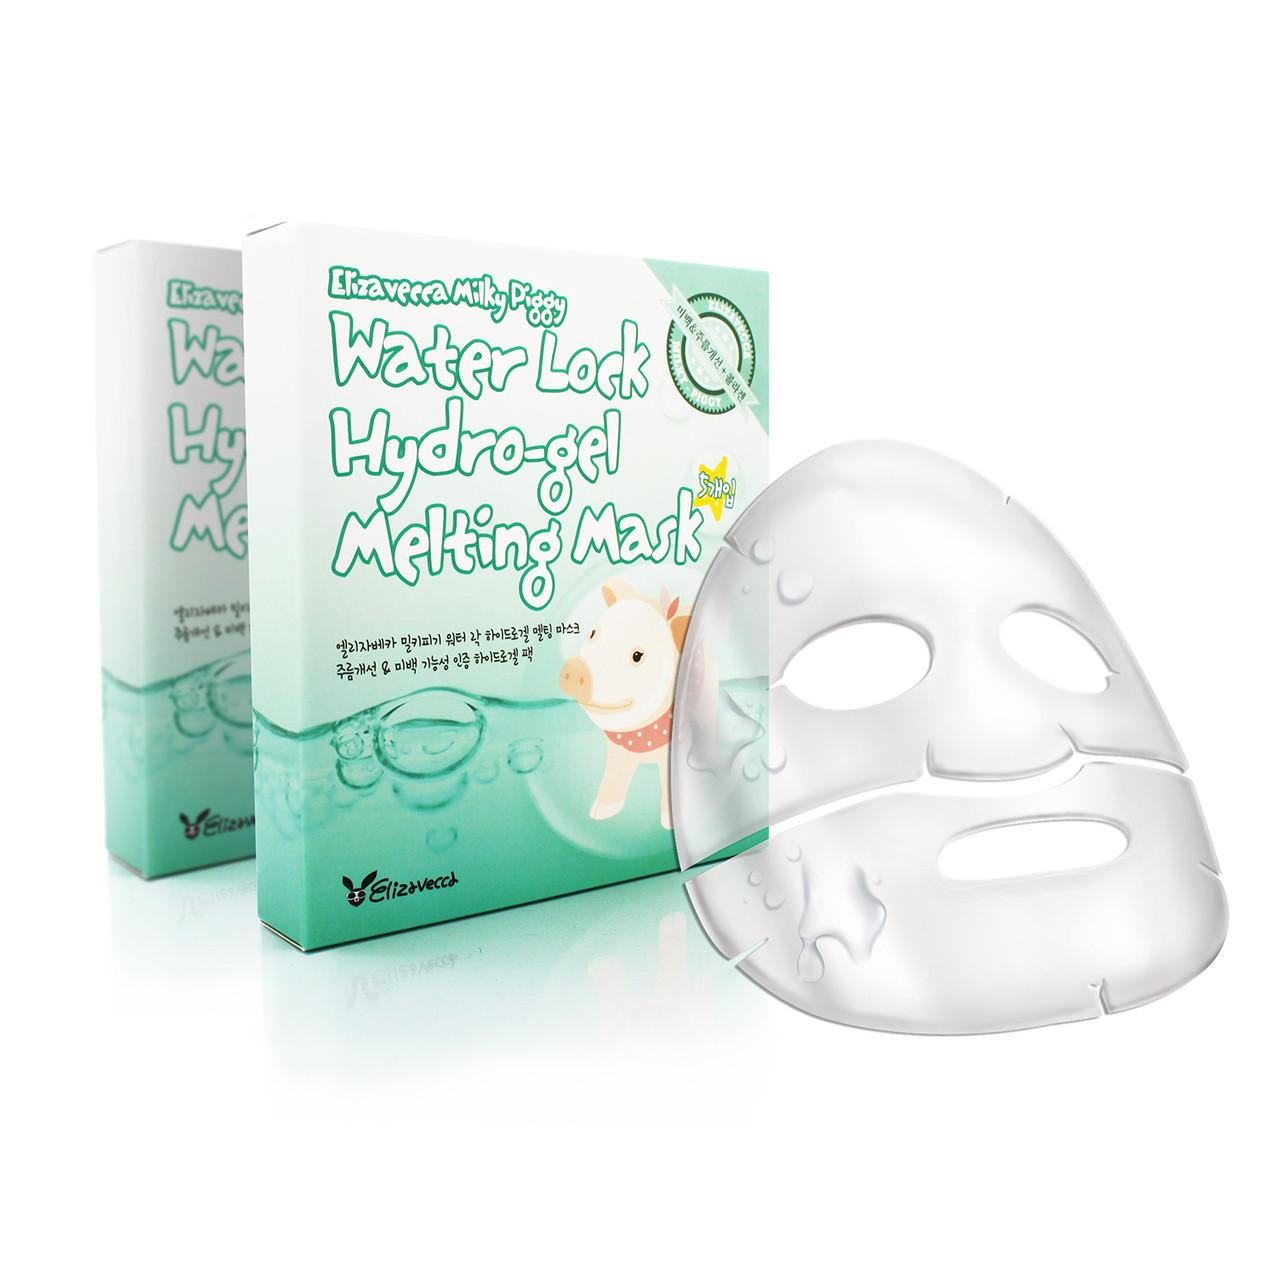 Гидрогелевая лифтинг-маска ELIZAVECCA Milky Piggy Water Lock Hydrogel Melting Mask, 1 шт)